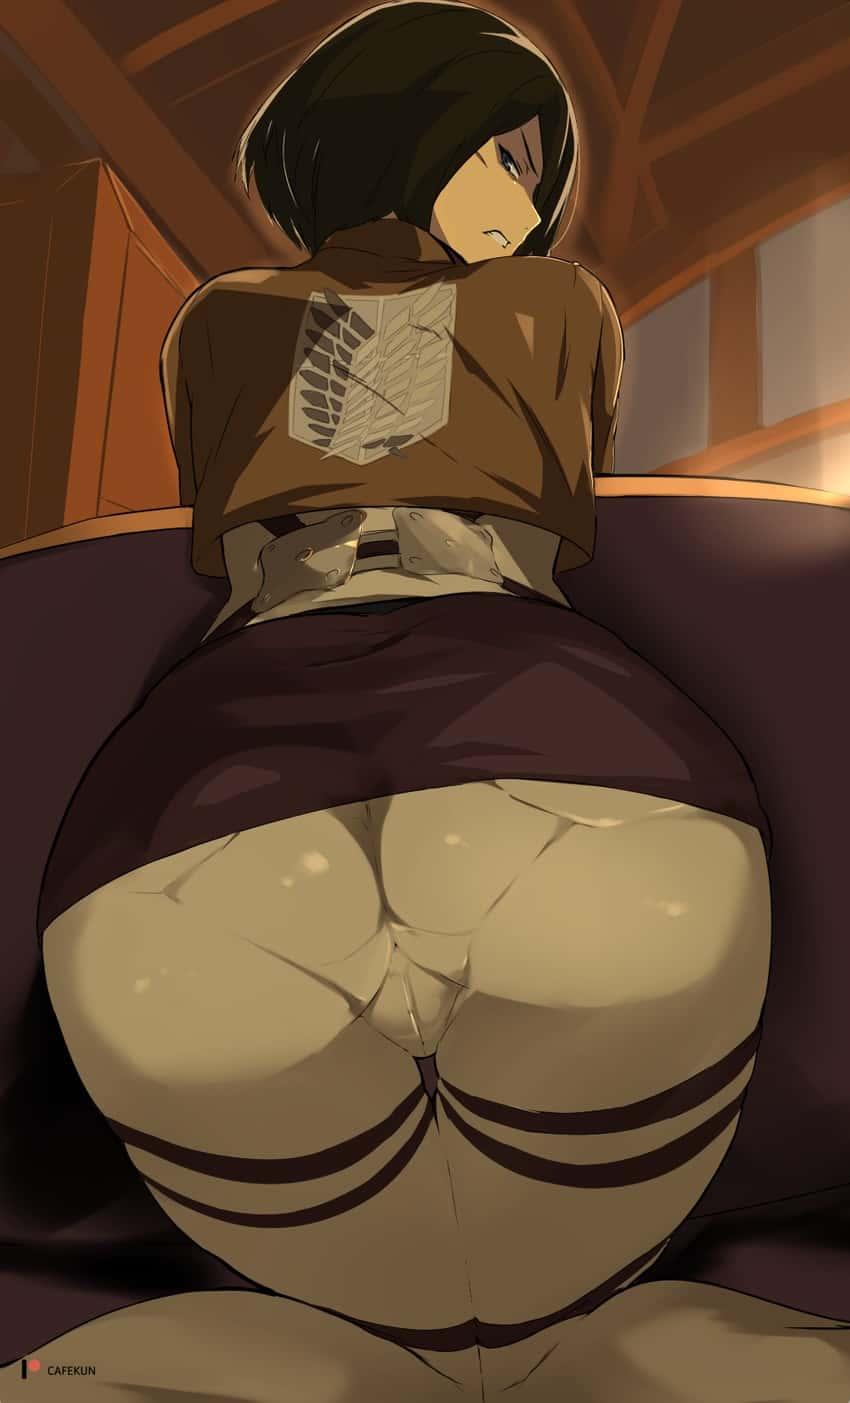 mikasa ackerman shingeki no kyojin80 - 【進撃の巨人】ミカサ・アッカーマンのエロ画像:イラスト その3